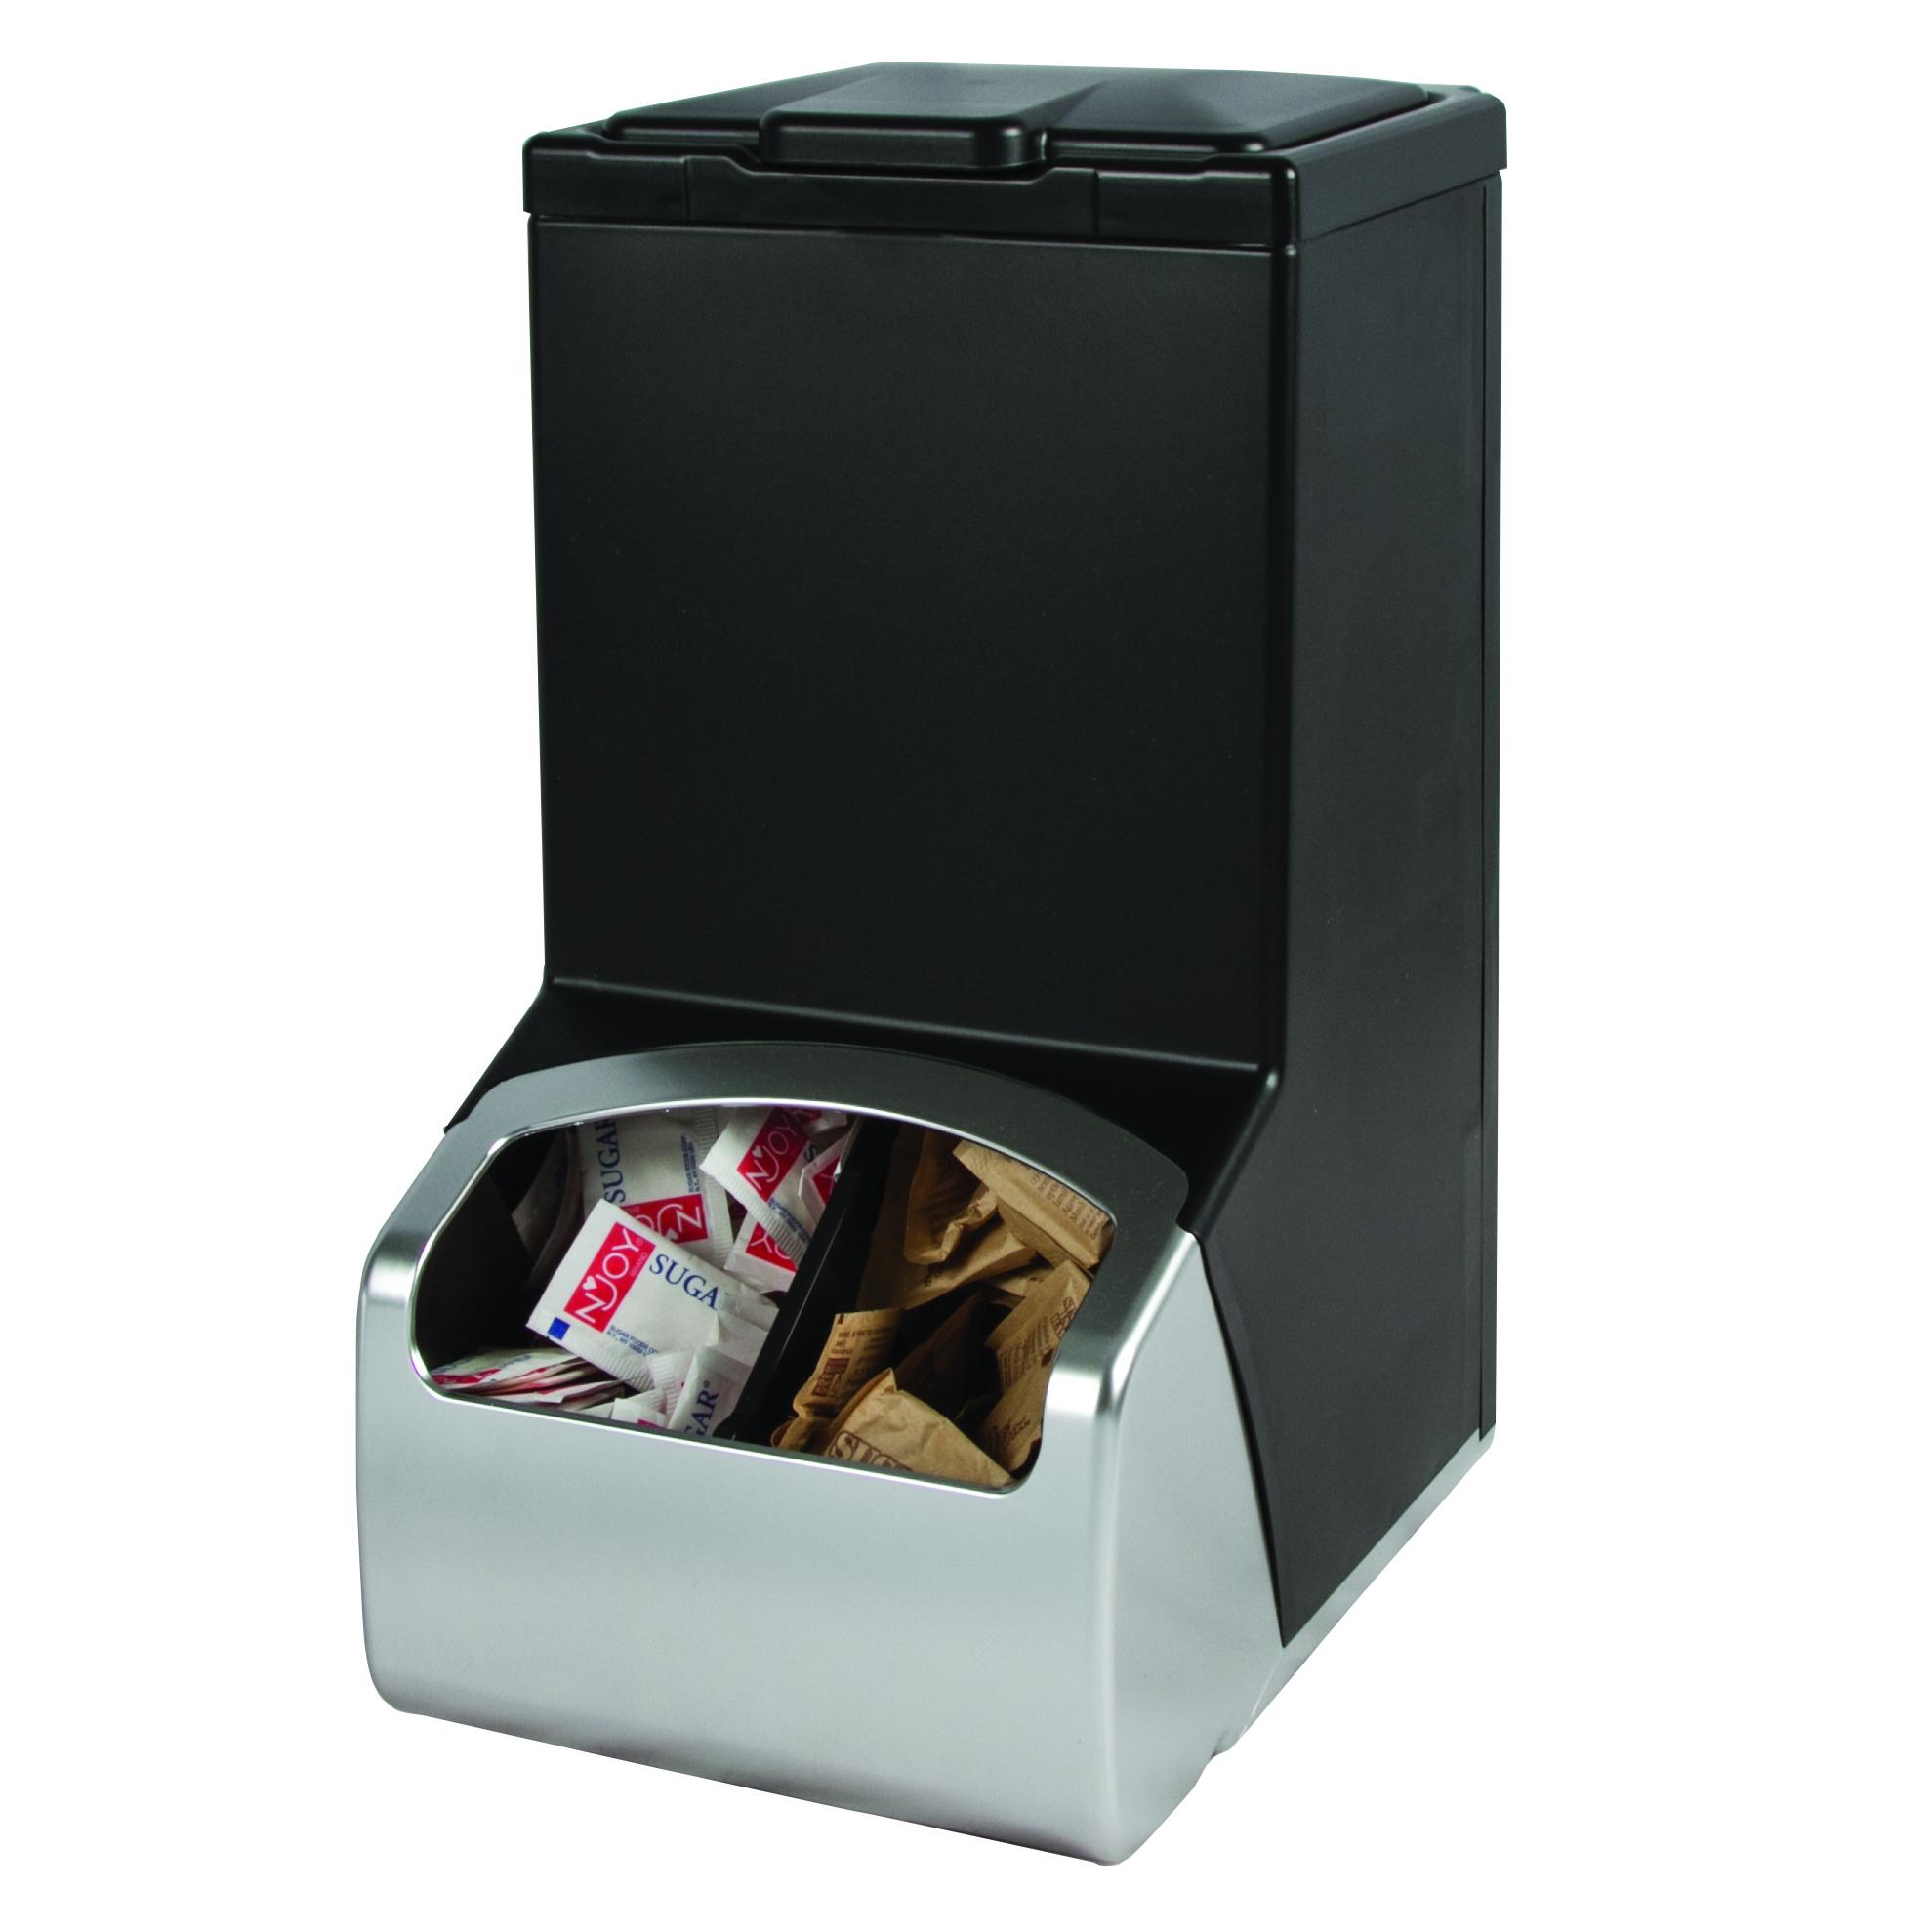 San Jamar MODBFD condiment caddy, countertop organizer